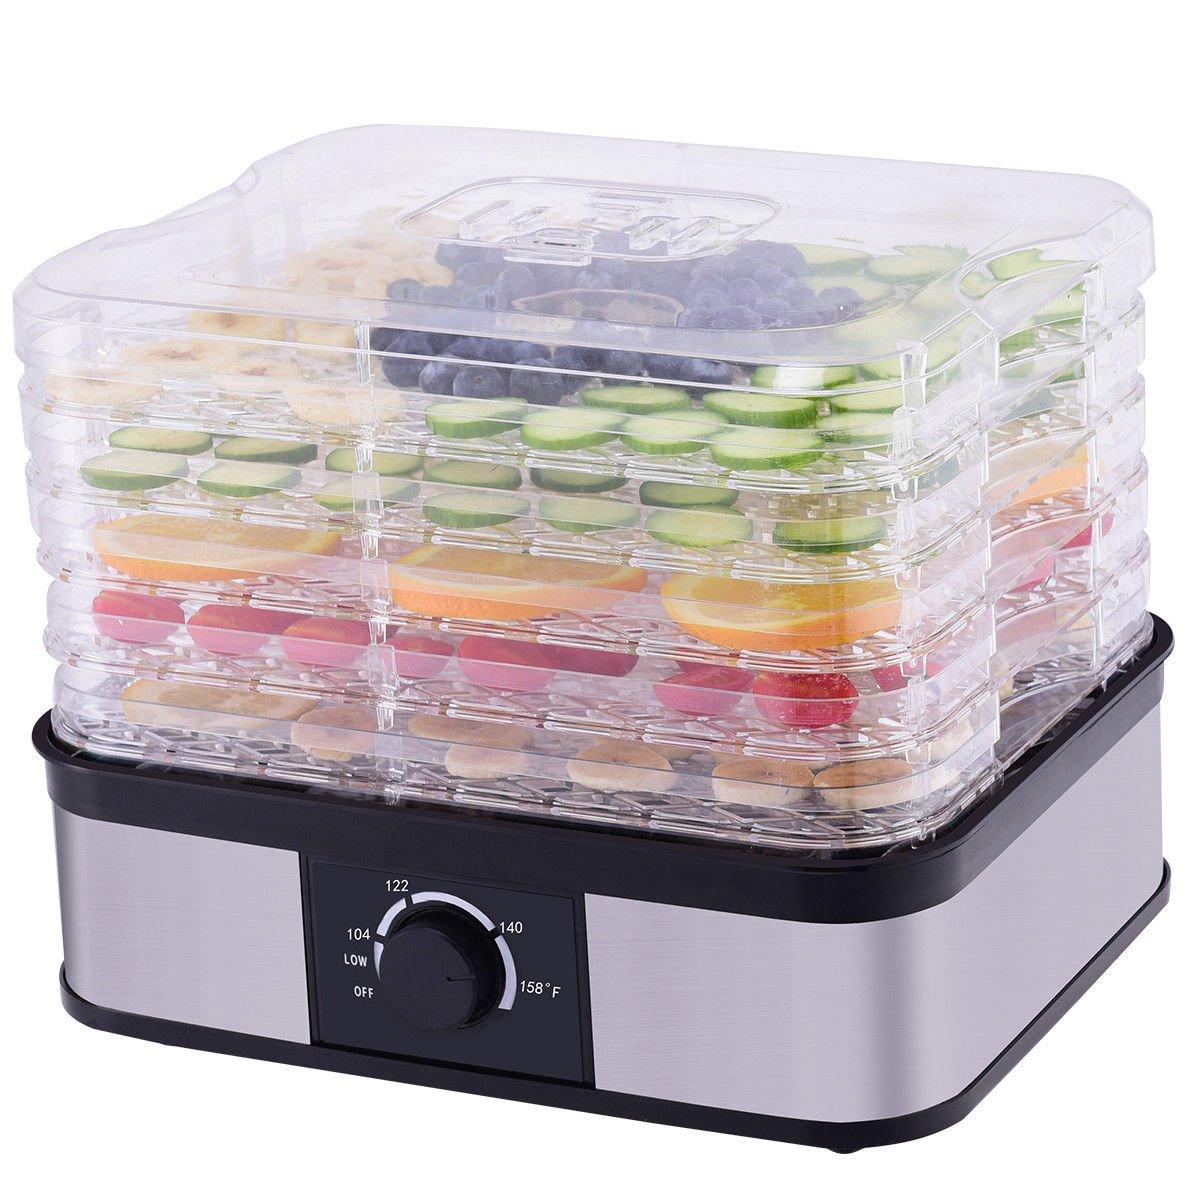 CHEFJOY 5 -Tray Food Dehydrator Food Preserver Fruit Vegetable Dryer Temperature Control